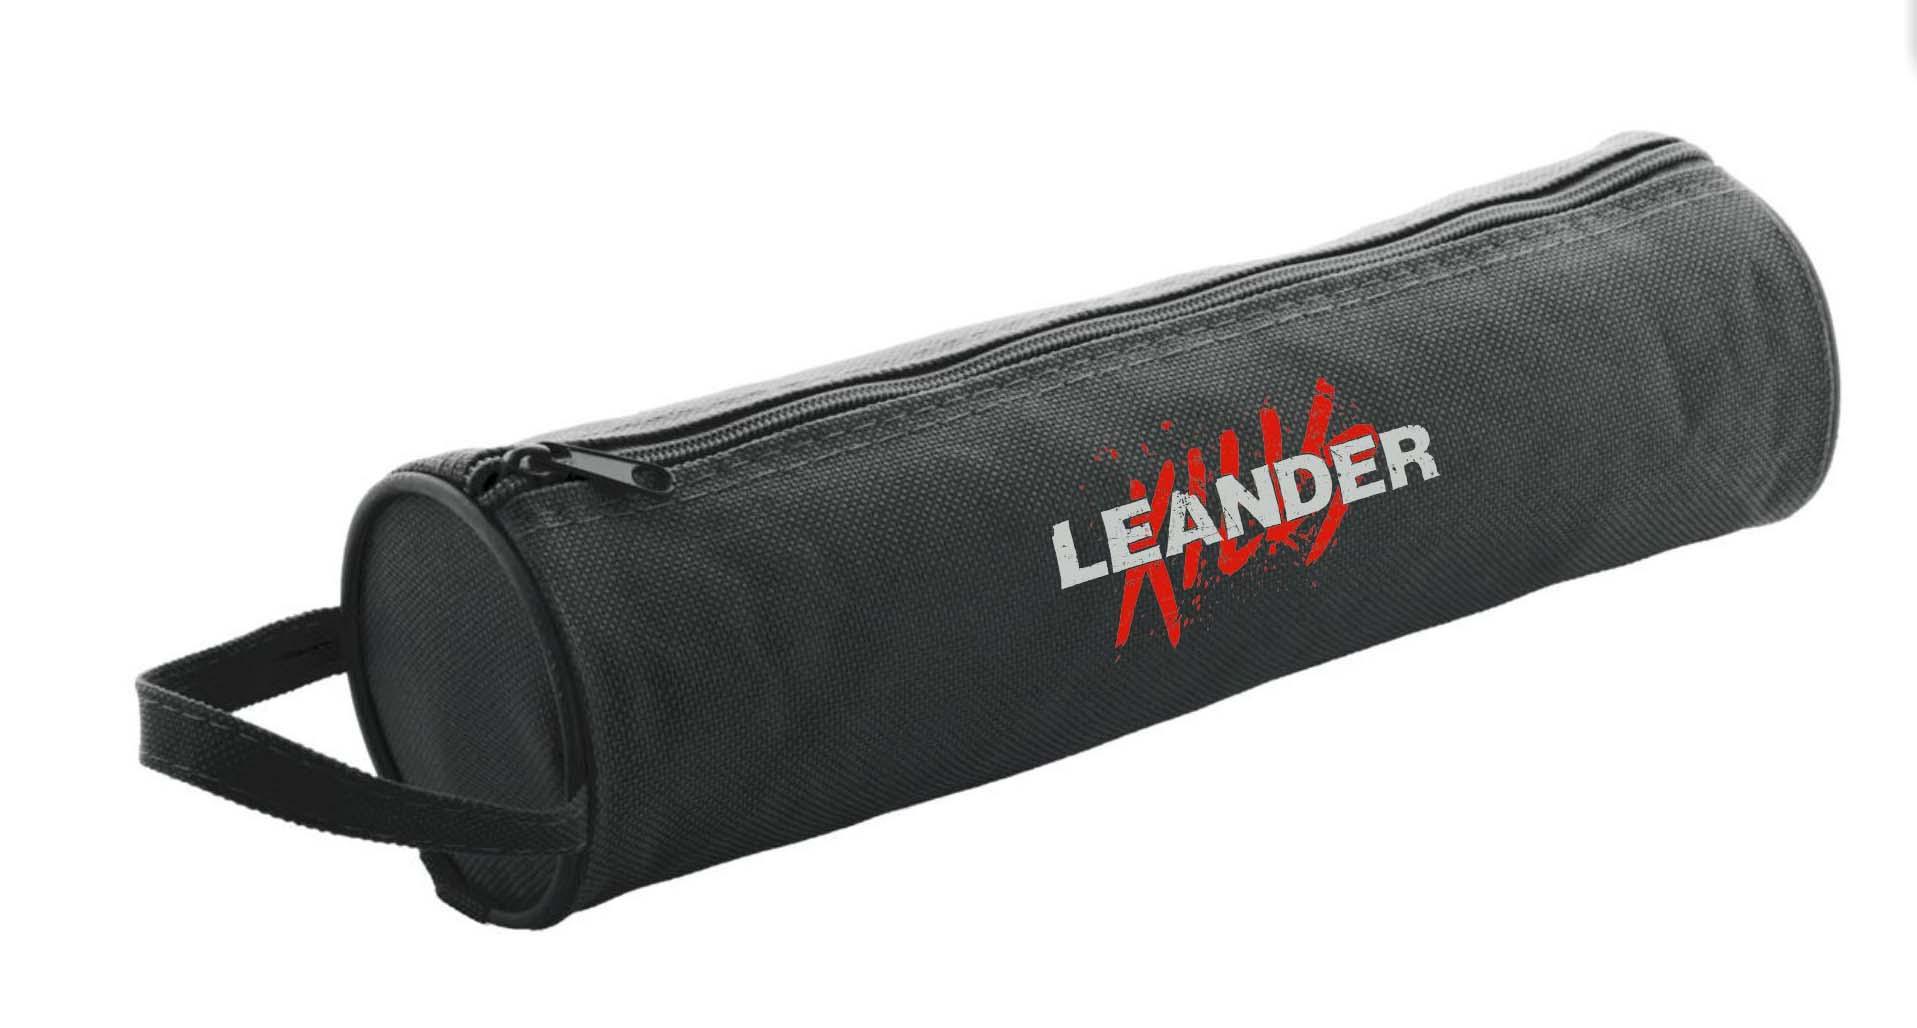 Leander Kills - Tolltartó (fekete) - 22 00e6124c0c